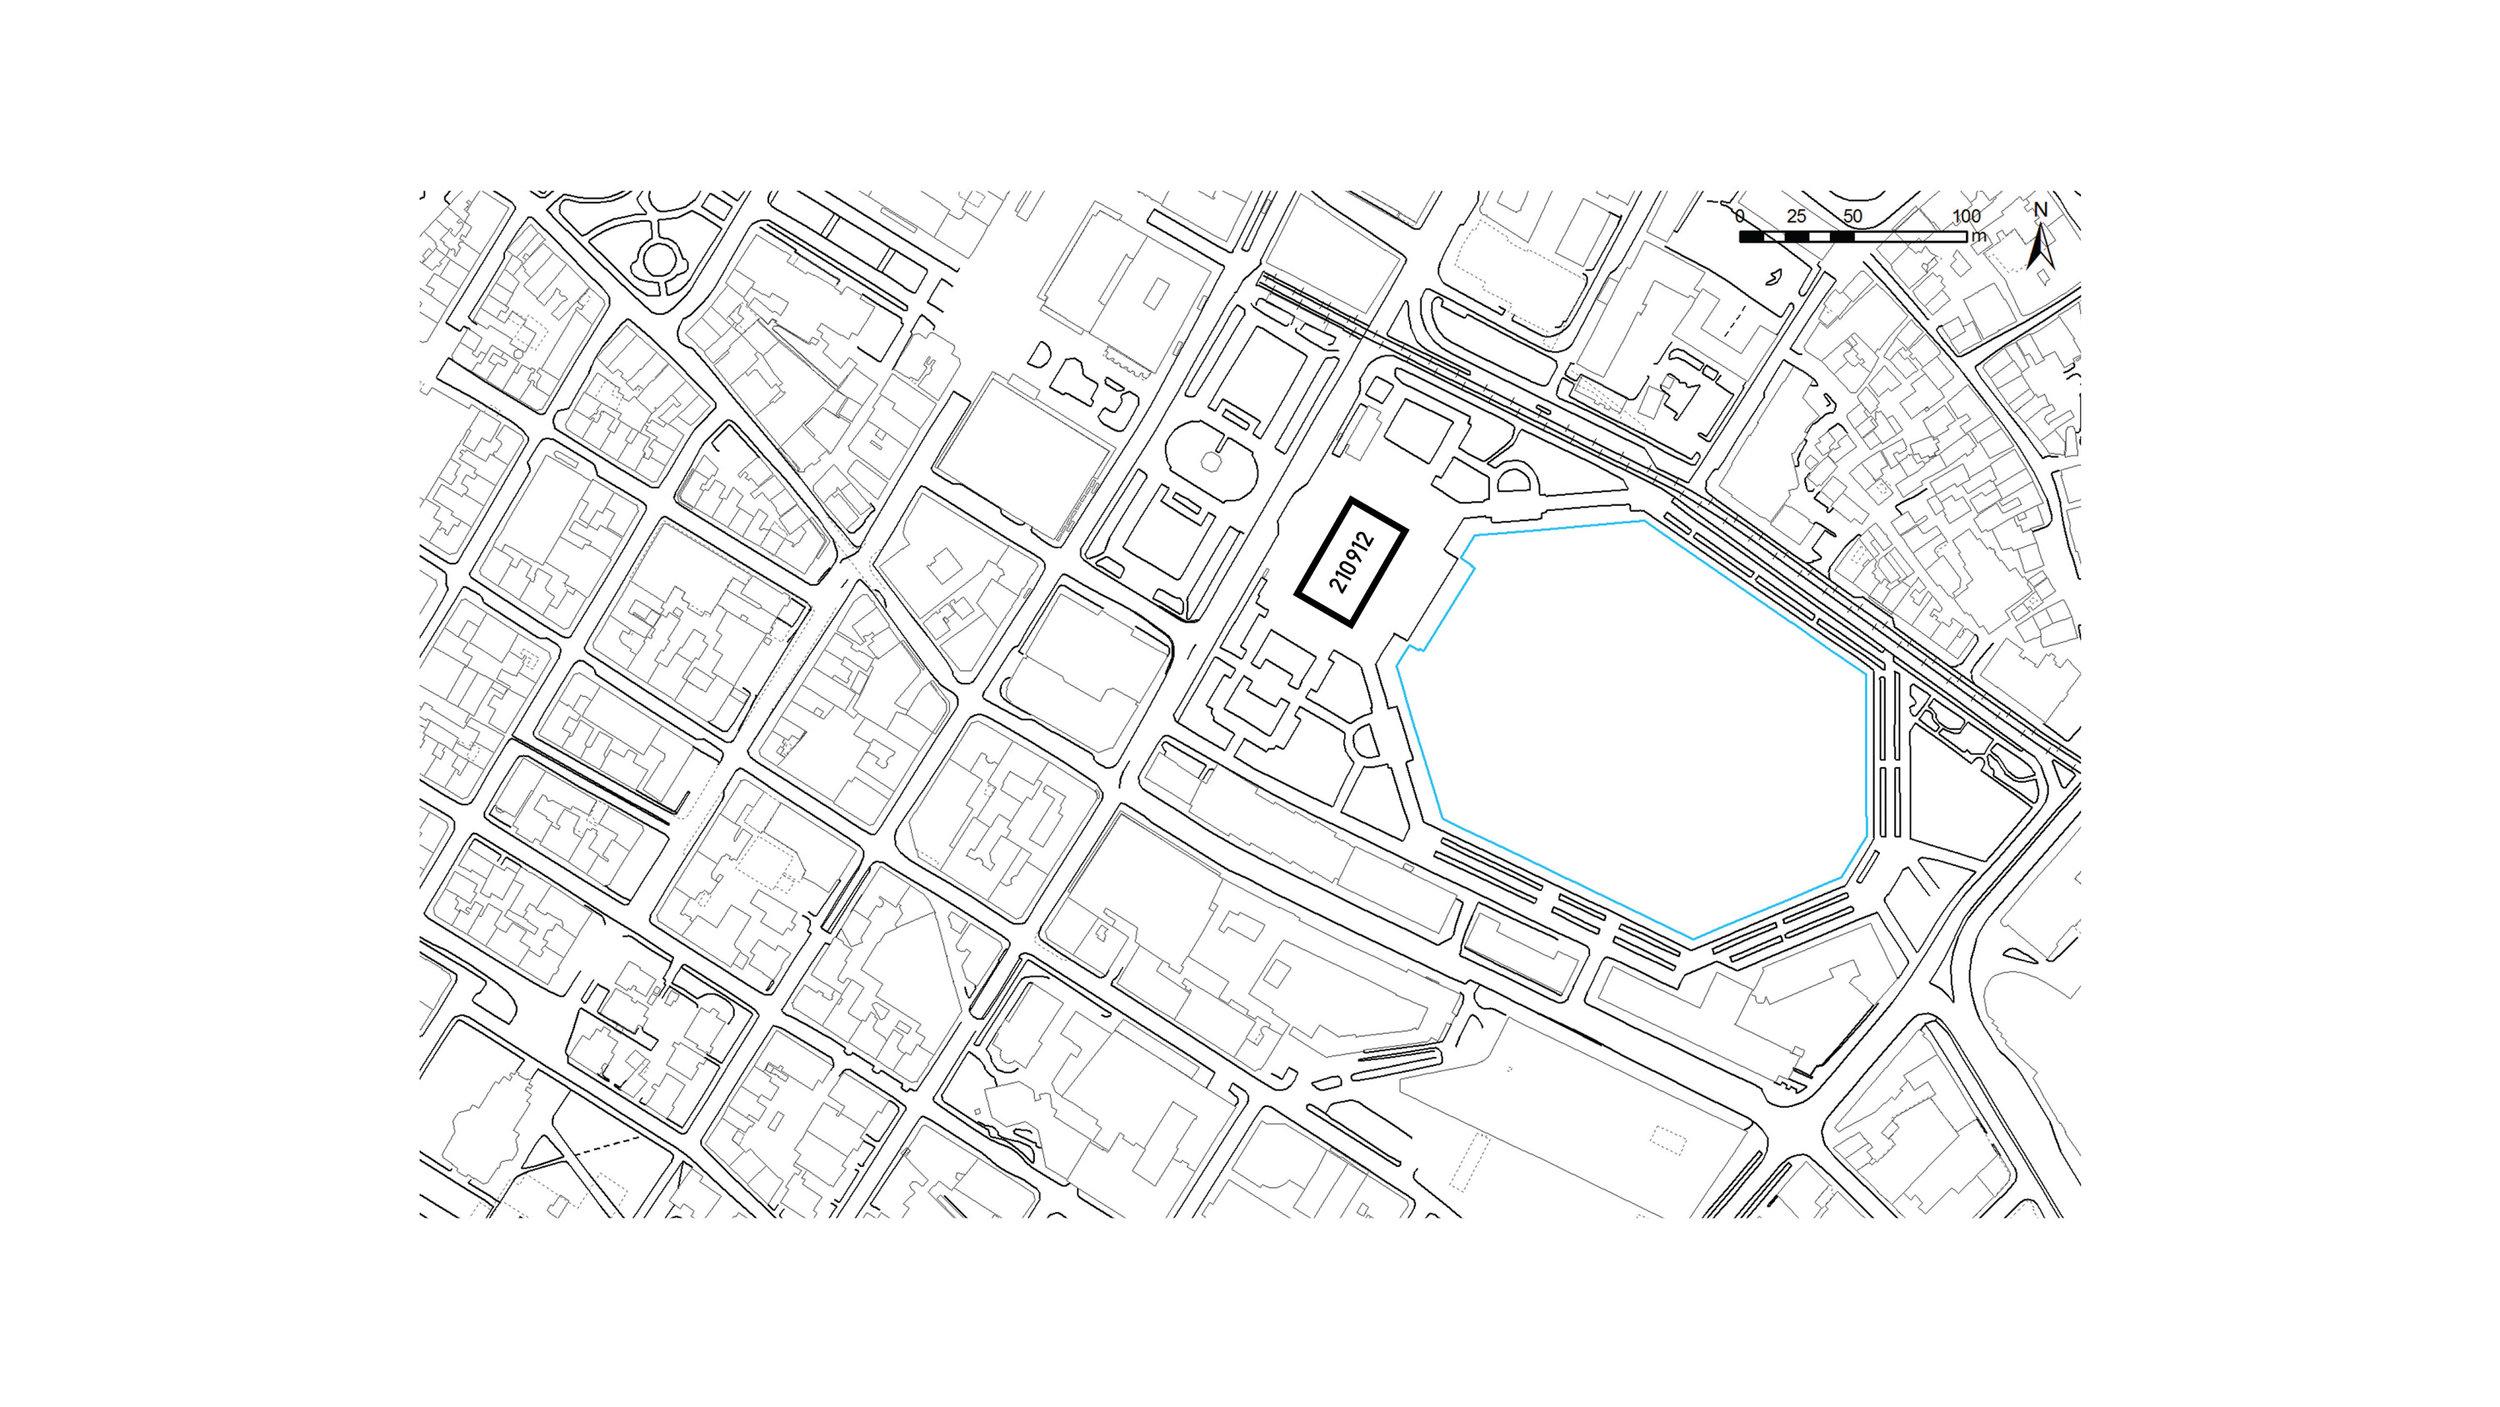 210912 Pavilion location